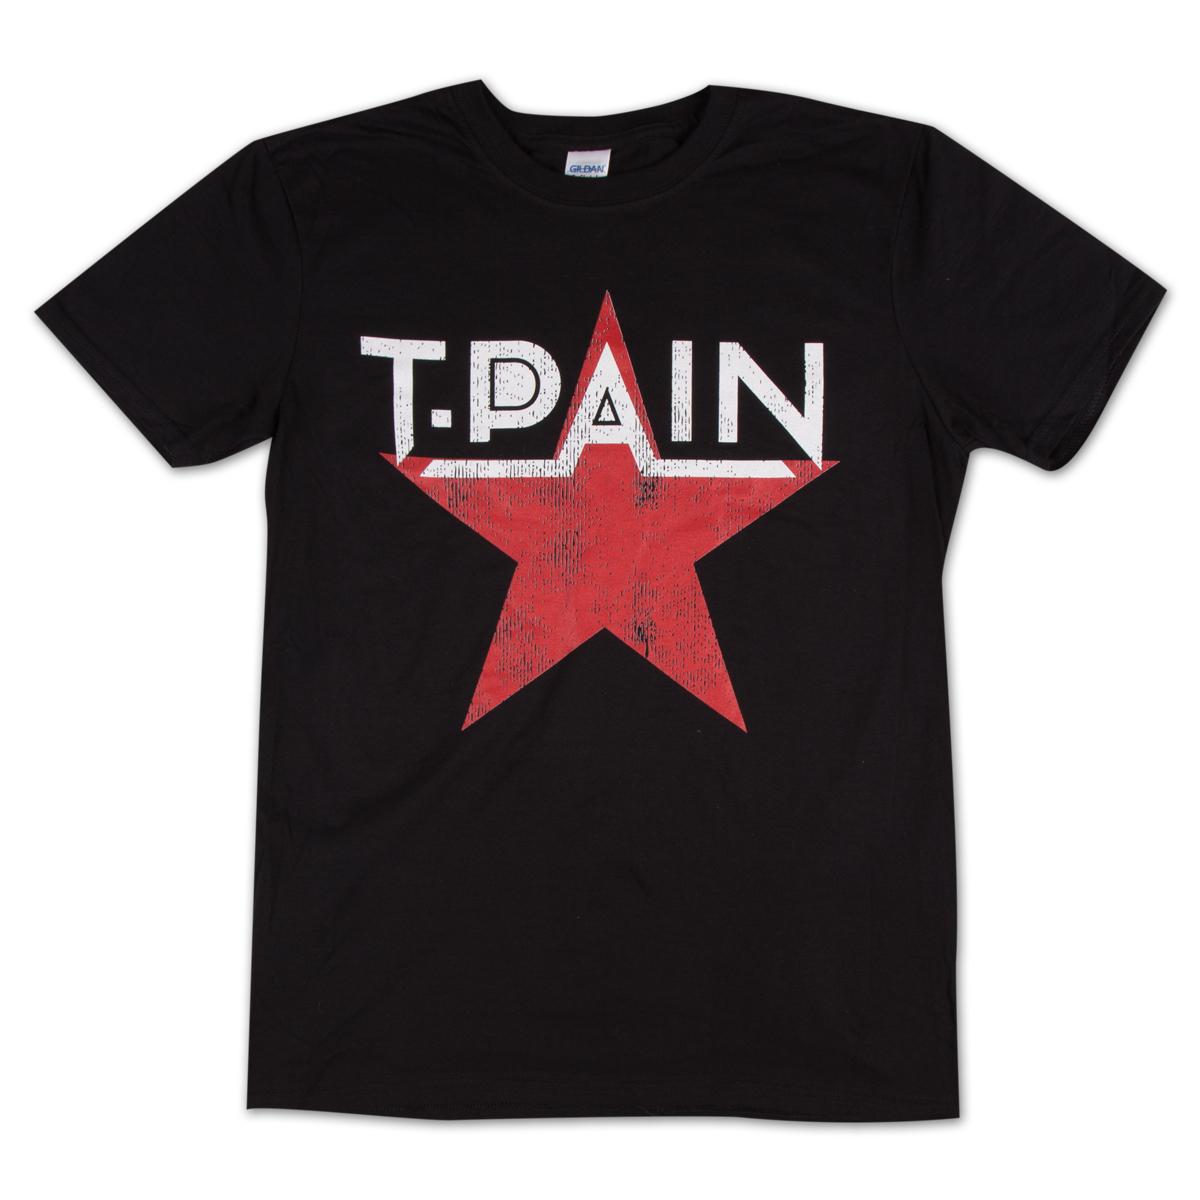 T-Pain Star T-shirt